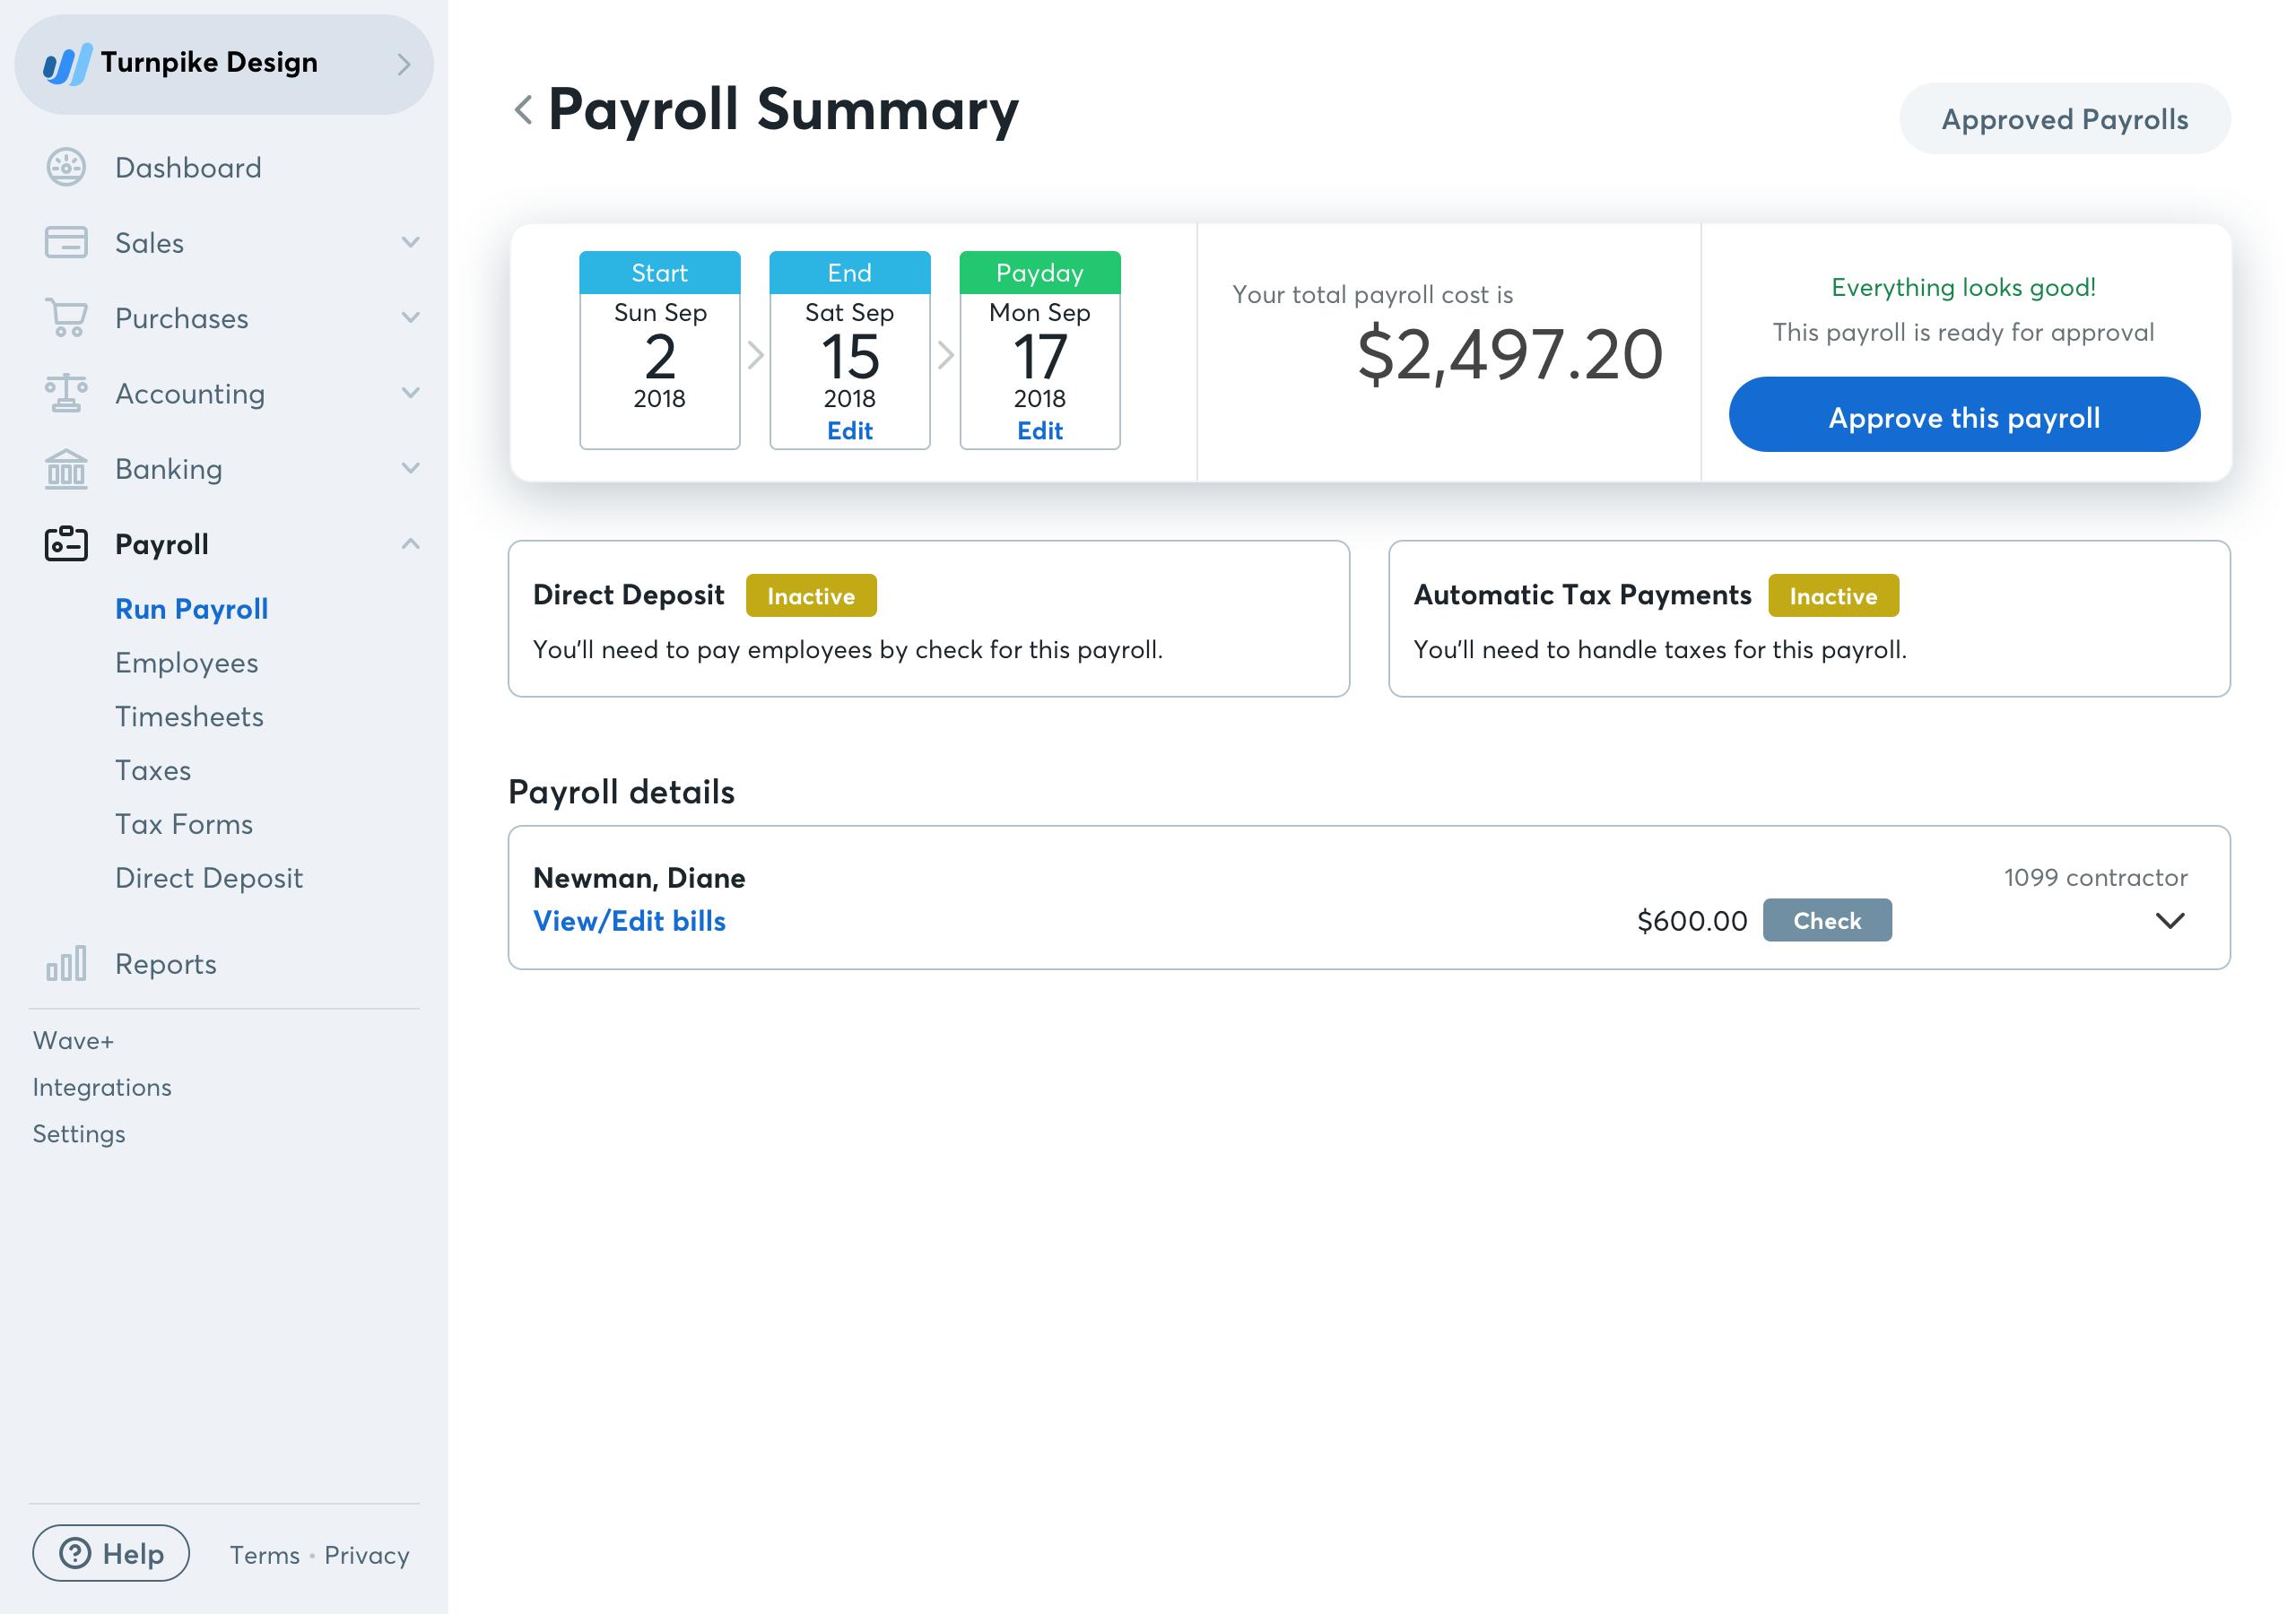 Payroll Details